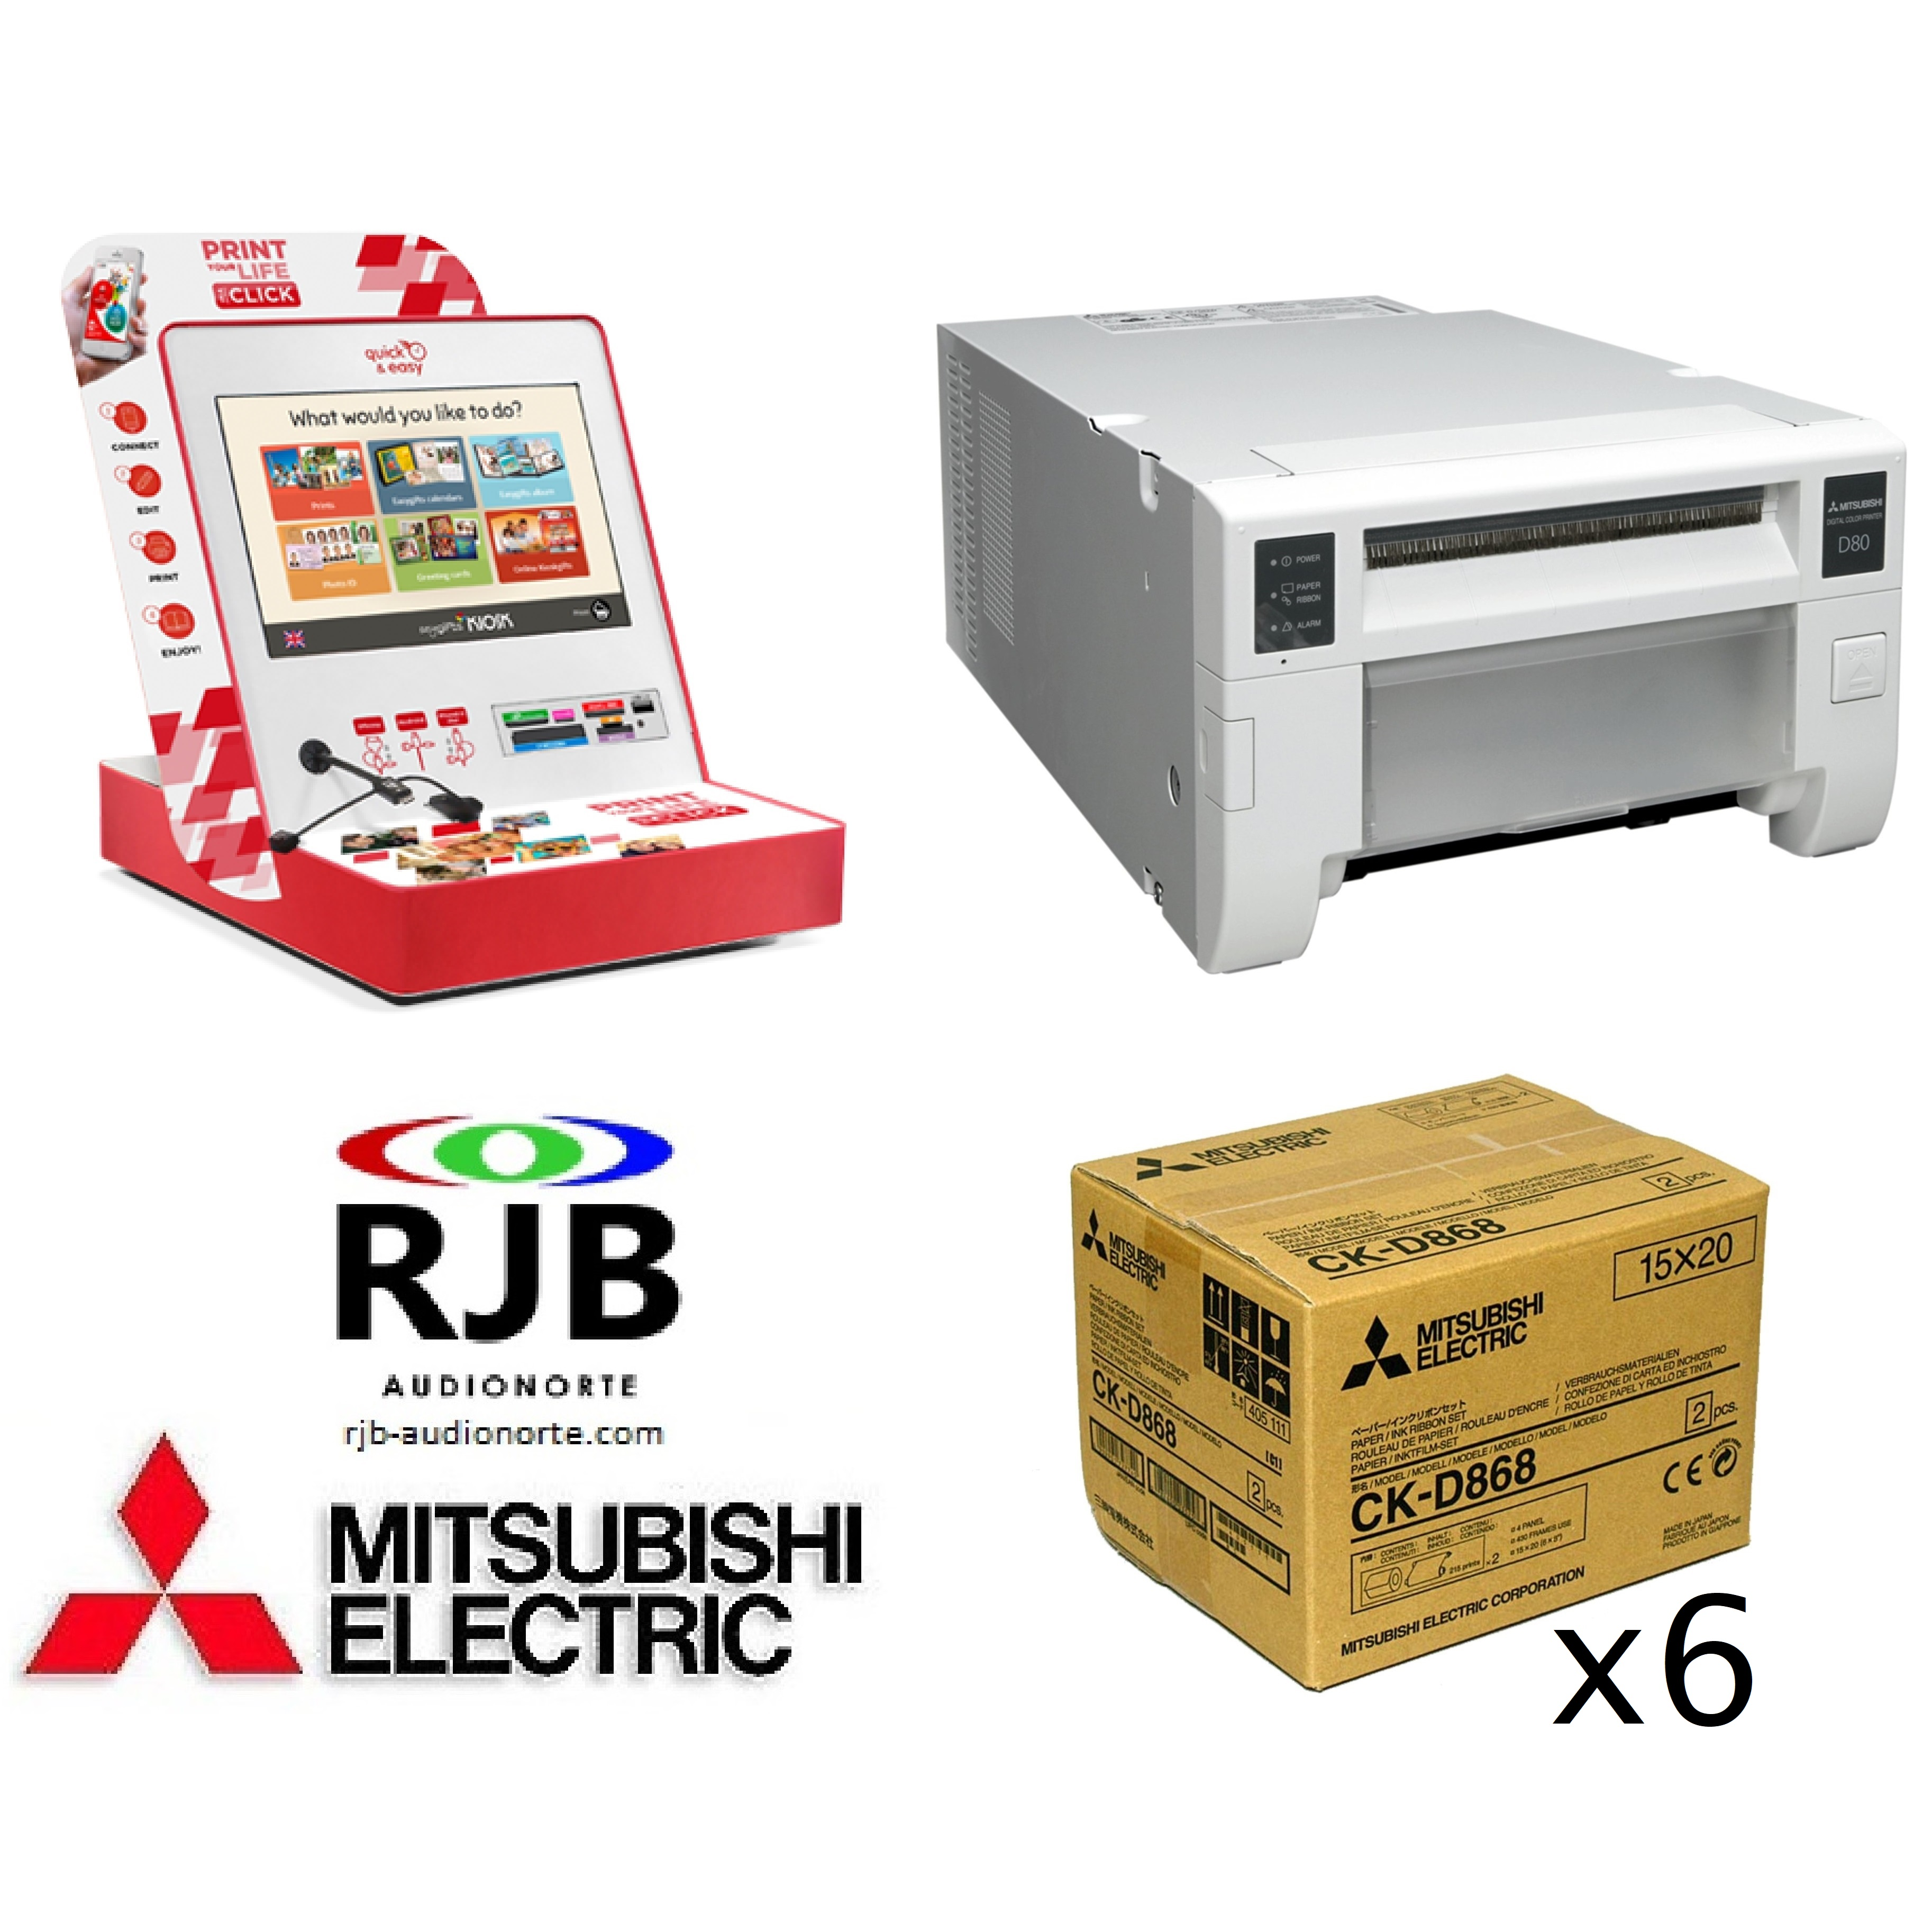 Mitsubishi Smart KioskGifts + Impresora CP-D80DW + 6 Cajas Papel CK-D868 GRATIS